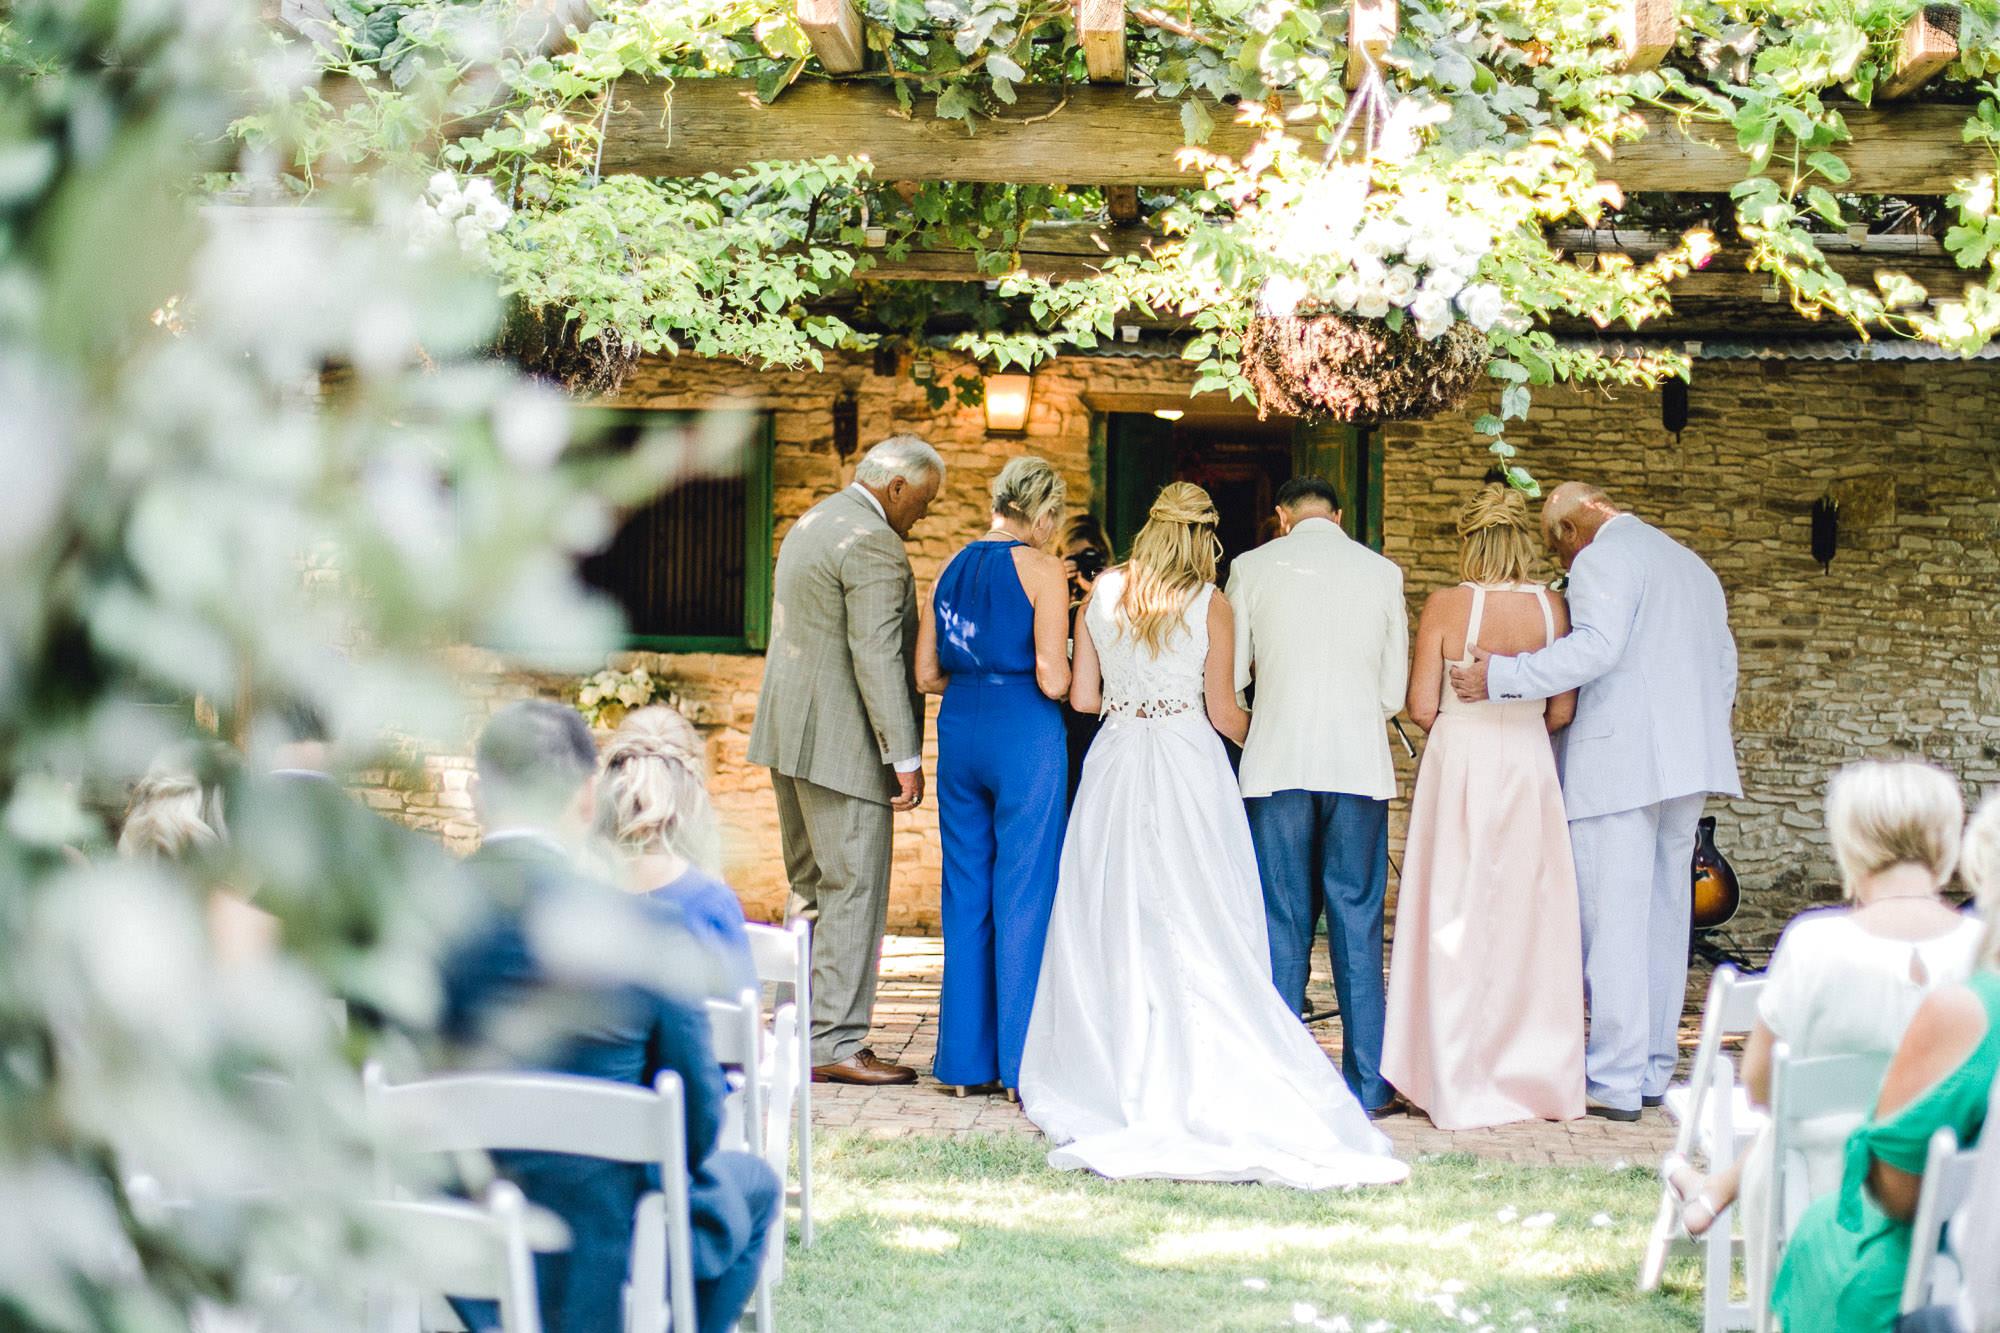 ali-brandon-hamilton-lubbock-wedding-photographer-estate-lee-lewis-construction-bee-alleej_0060.jpg